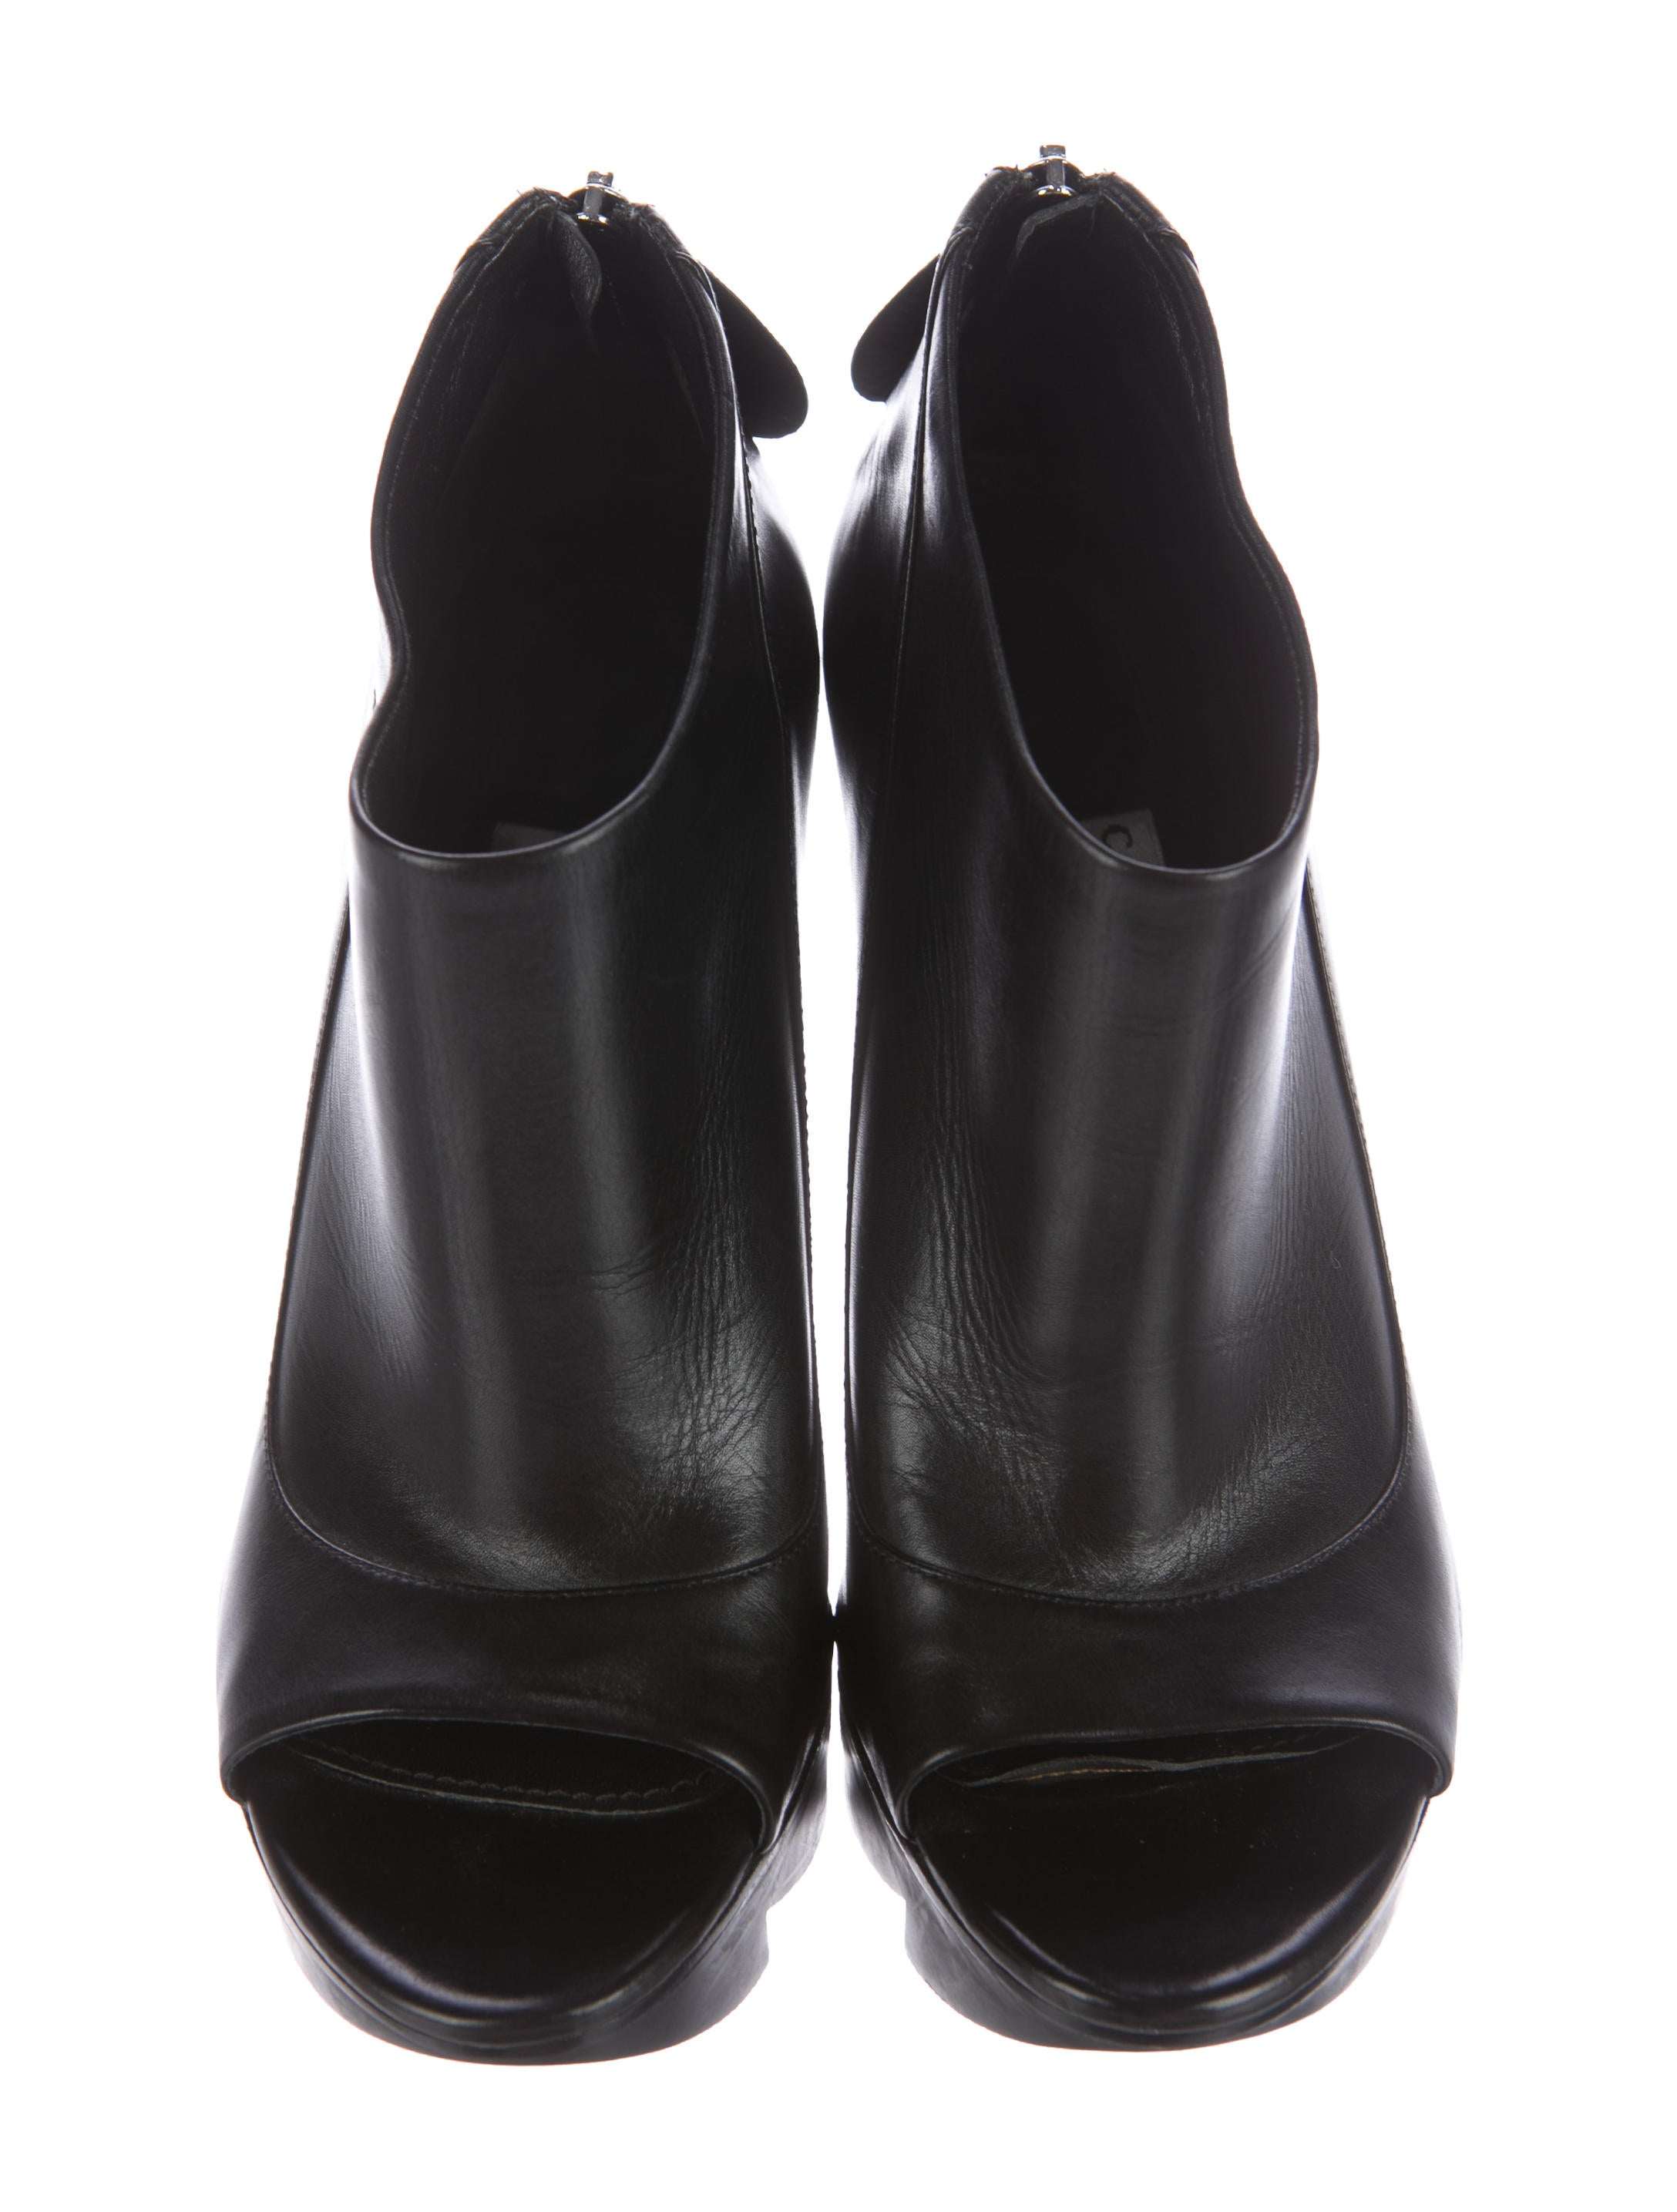 Camilla Skovgaard Leather Peep Toe Booties Shoes